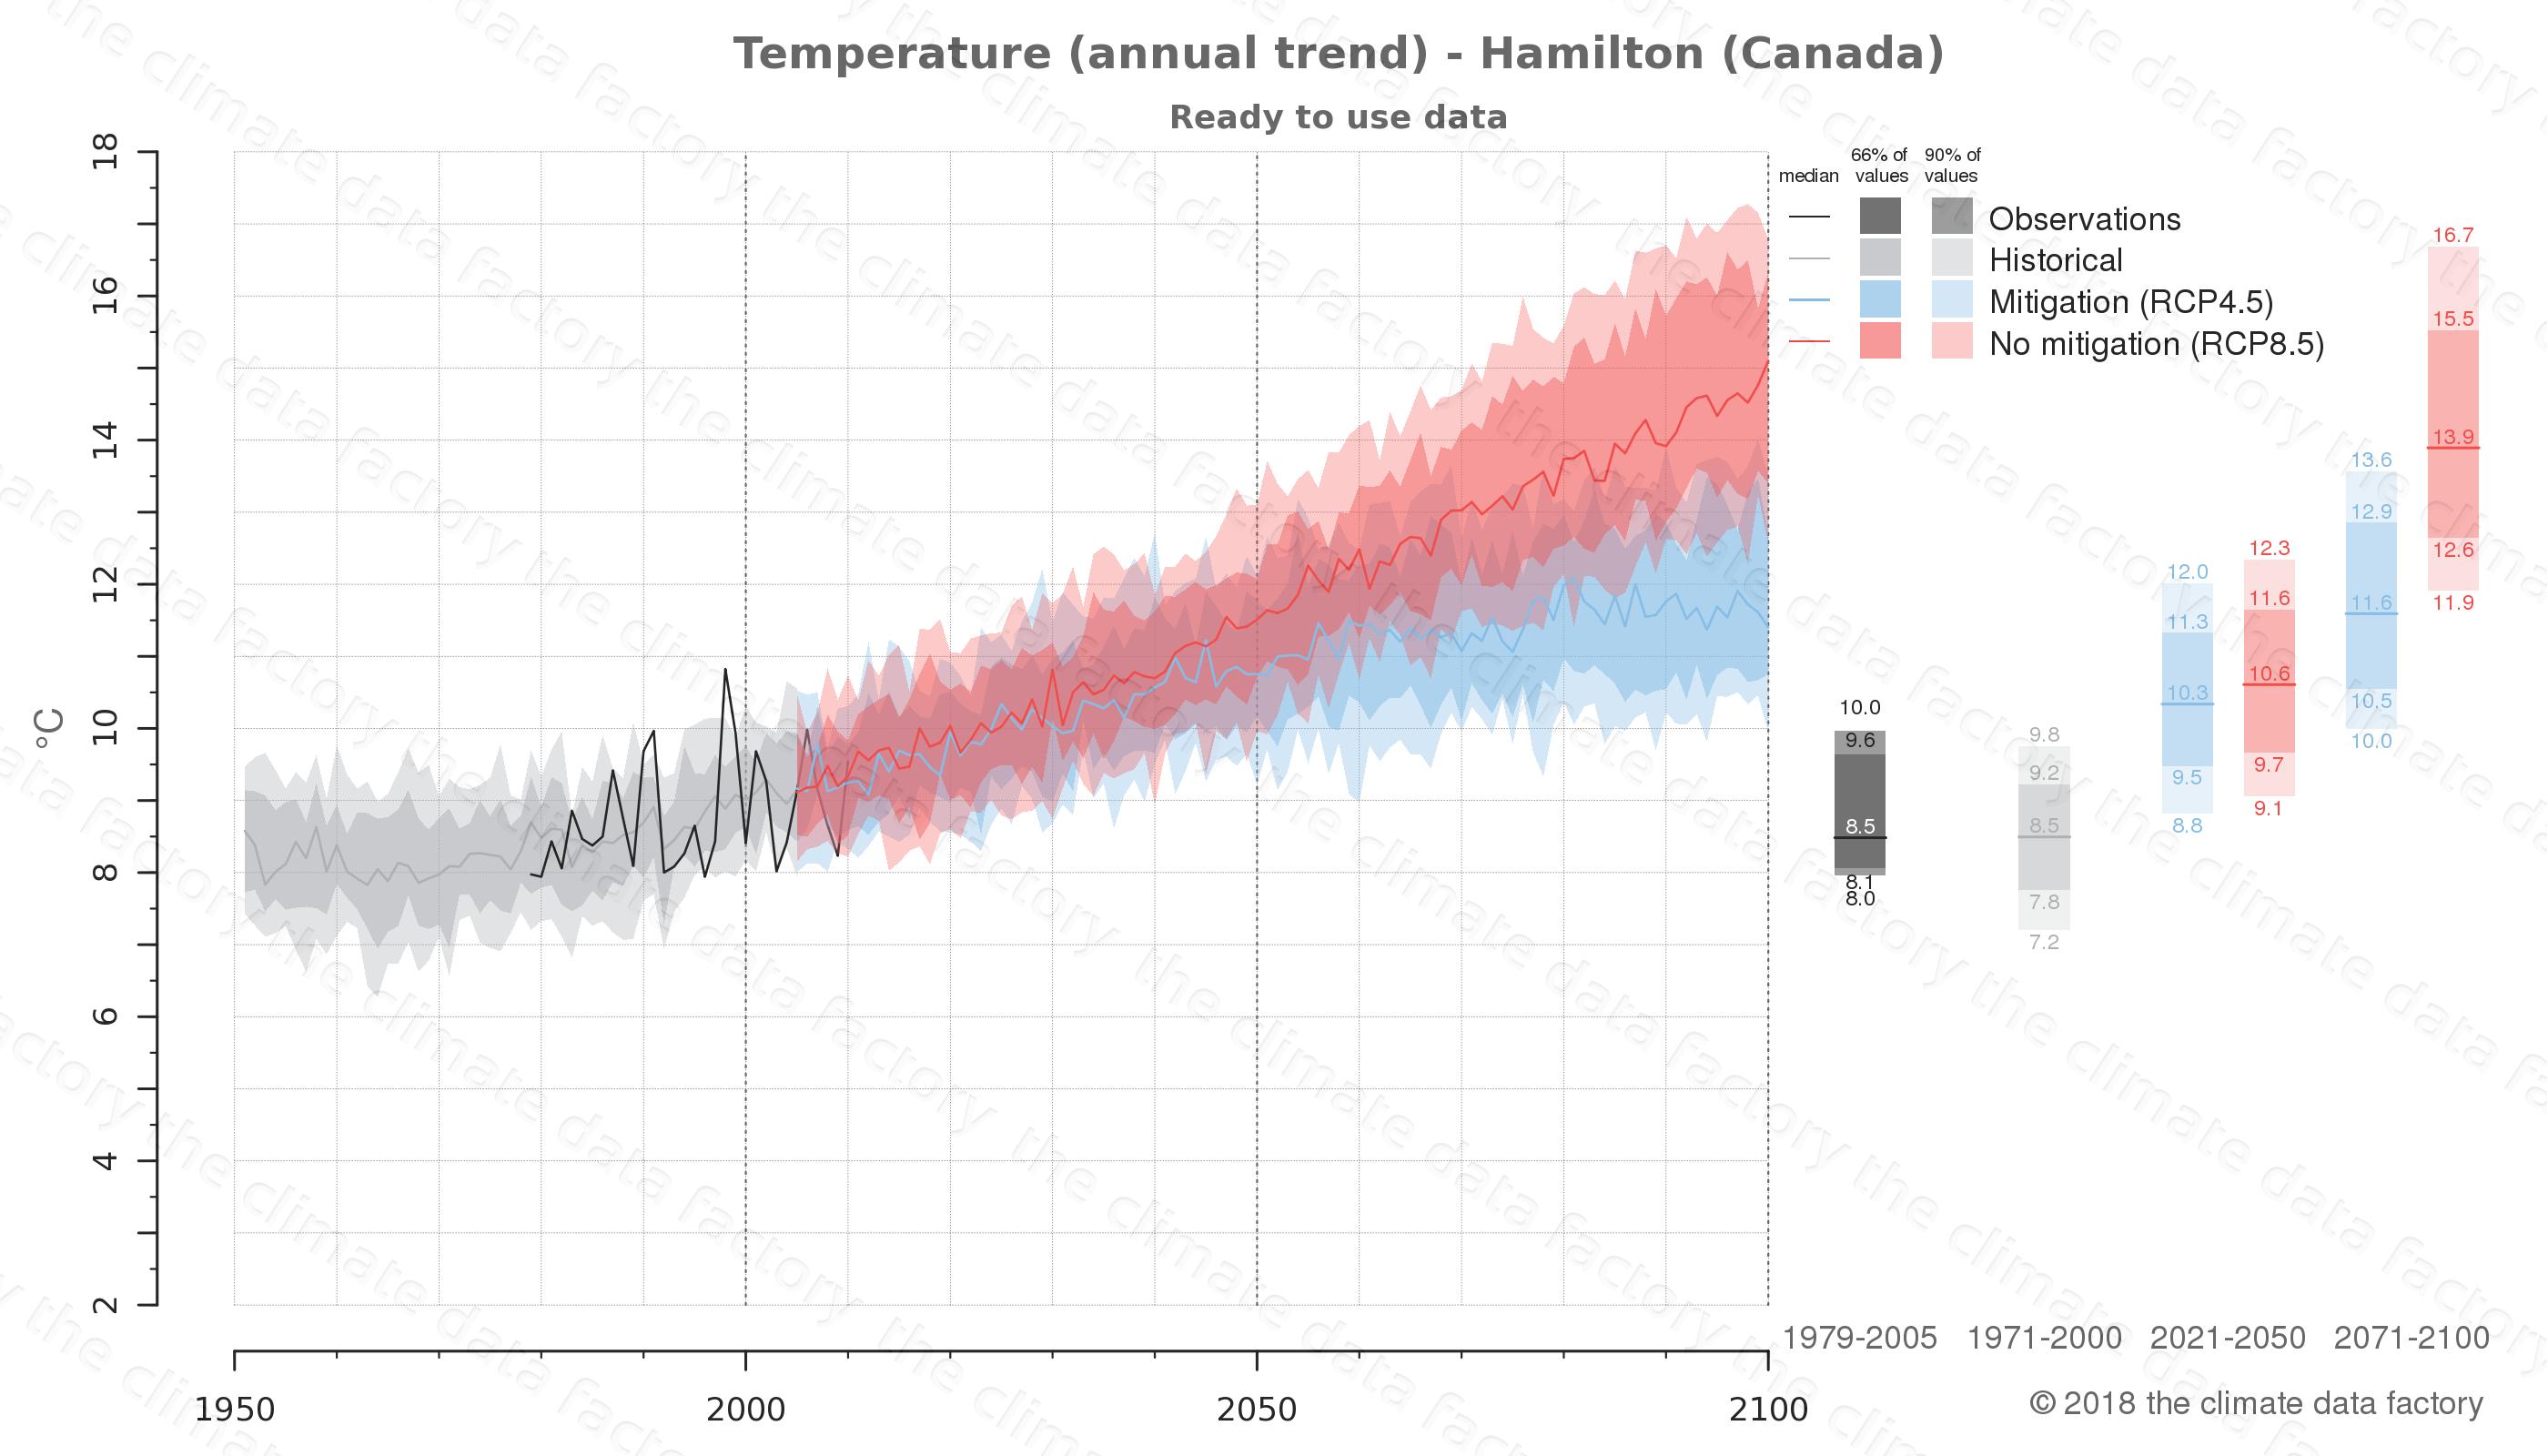 climate change data policy adaptation climate graph city data temperature hamilton canada